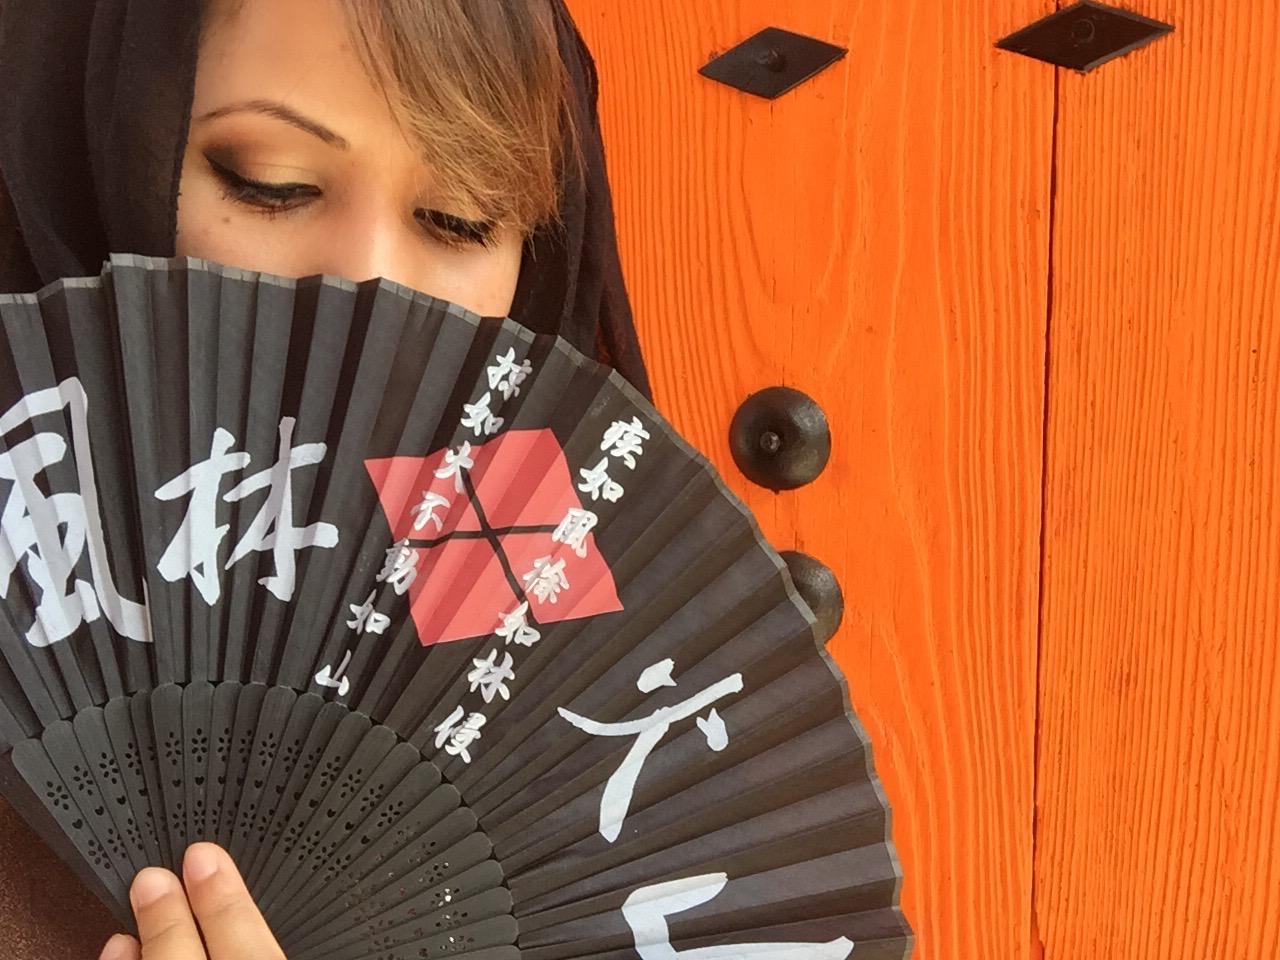 Muslim-halal-travel-tips-Kyoto-Higashiyama-District-fan.jpg